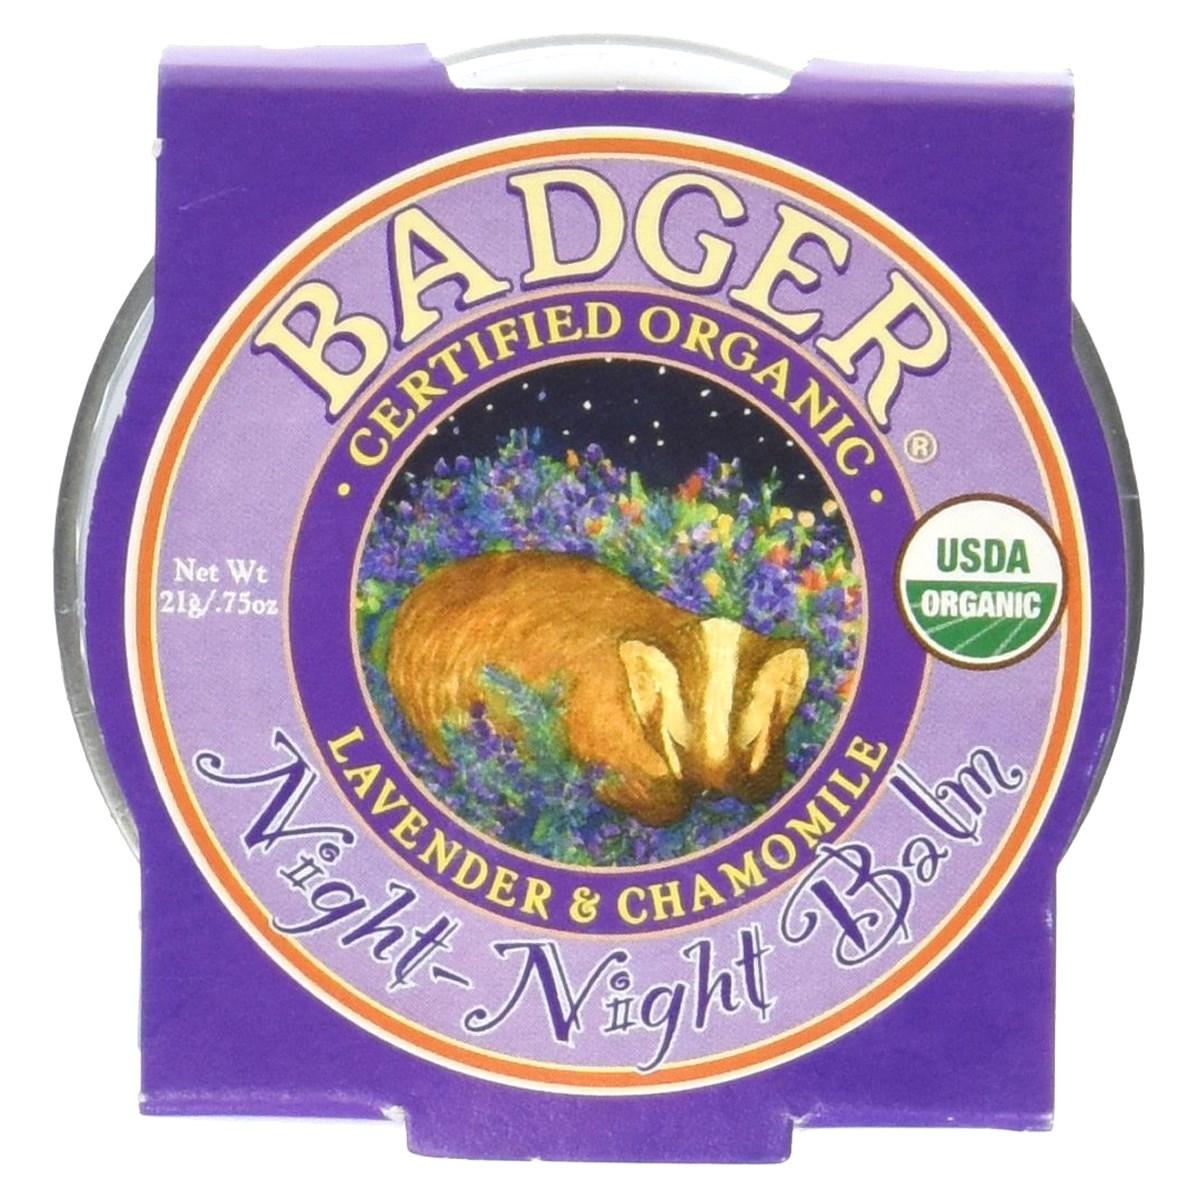 Badger Balm Night Night Balm